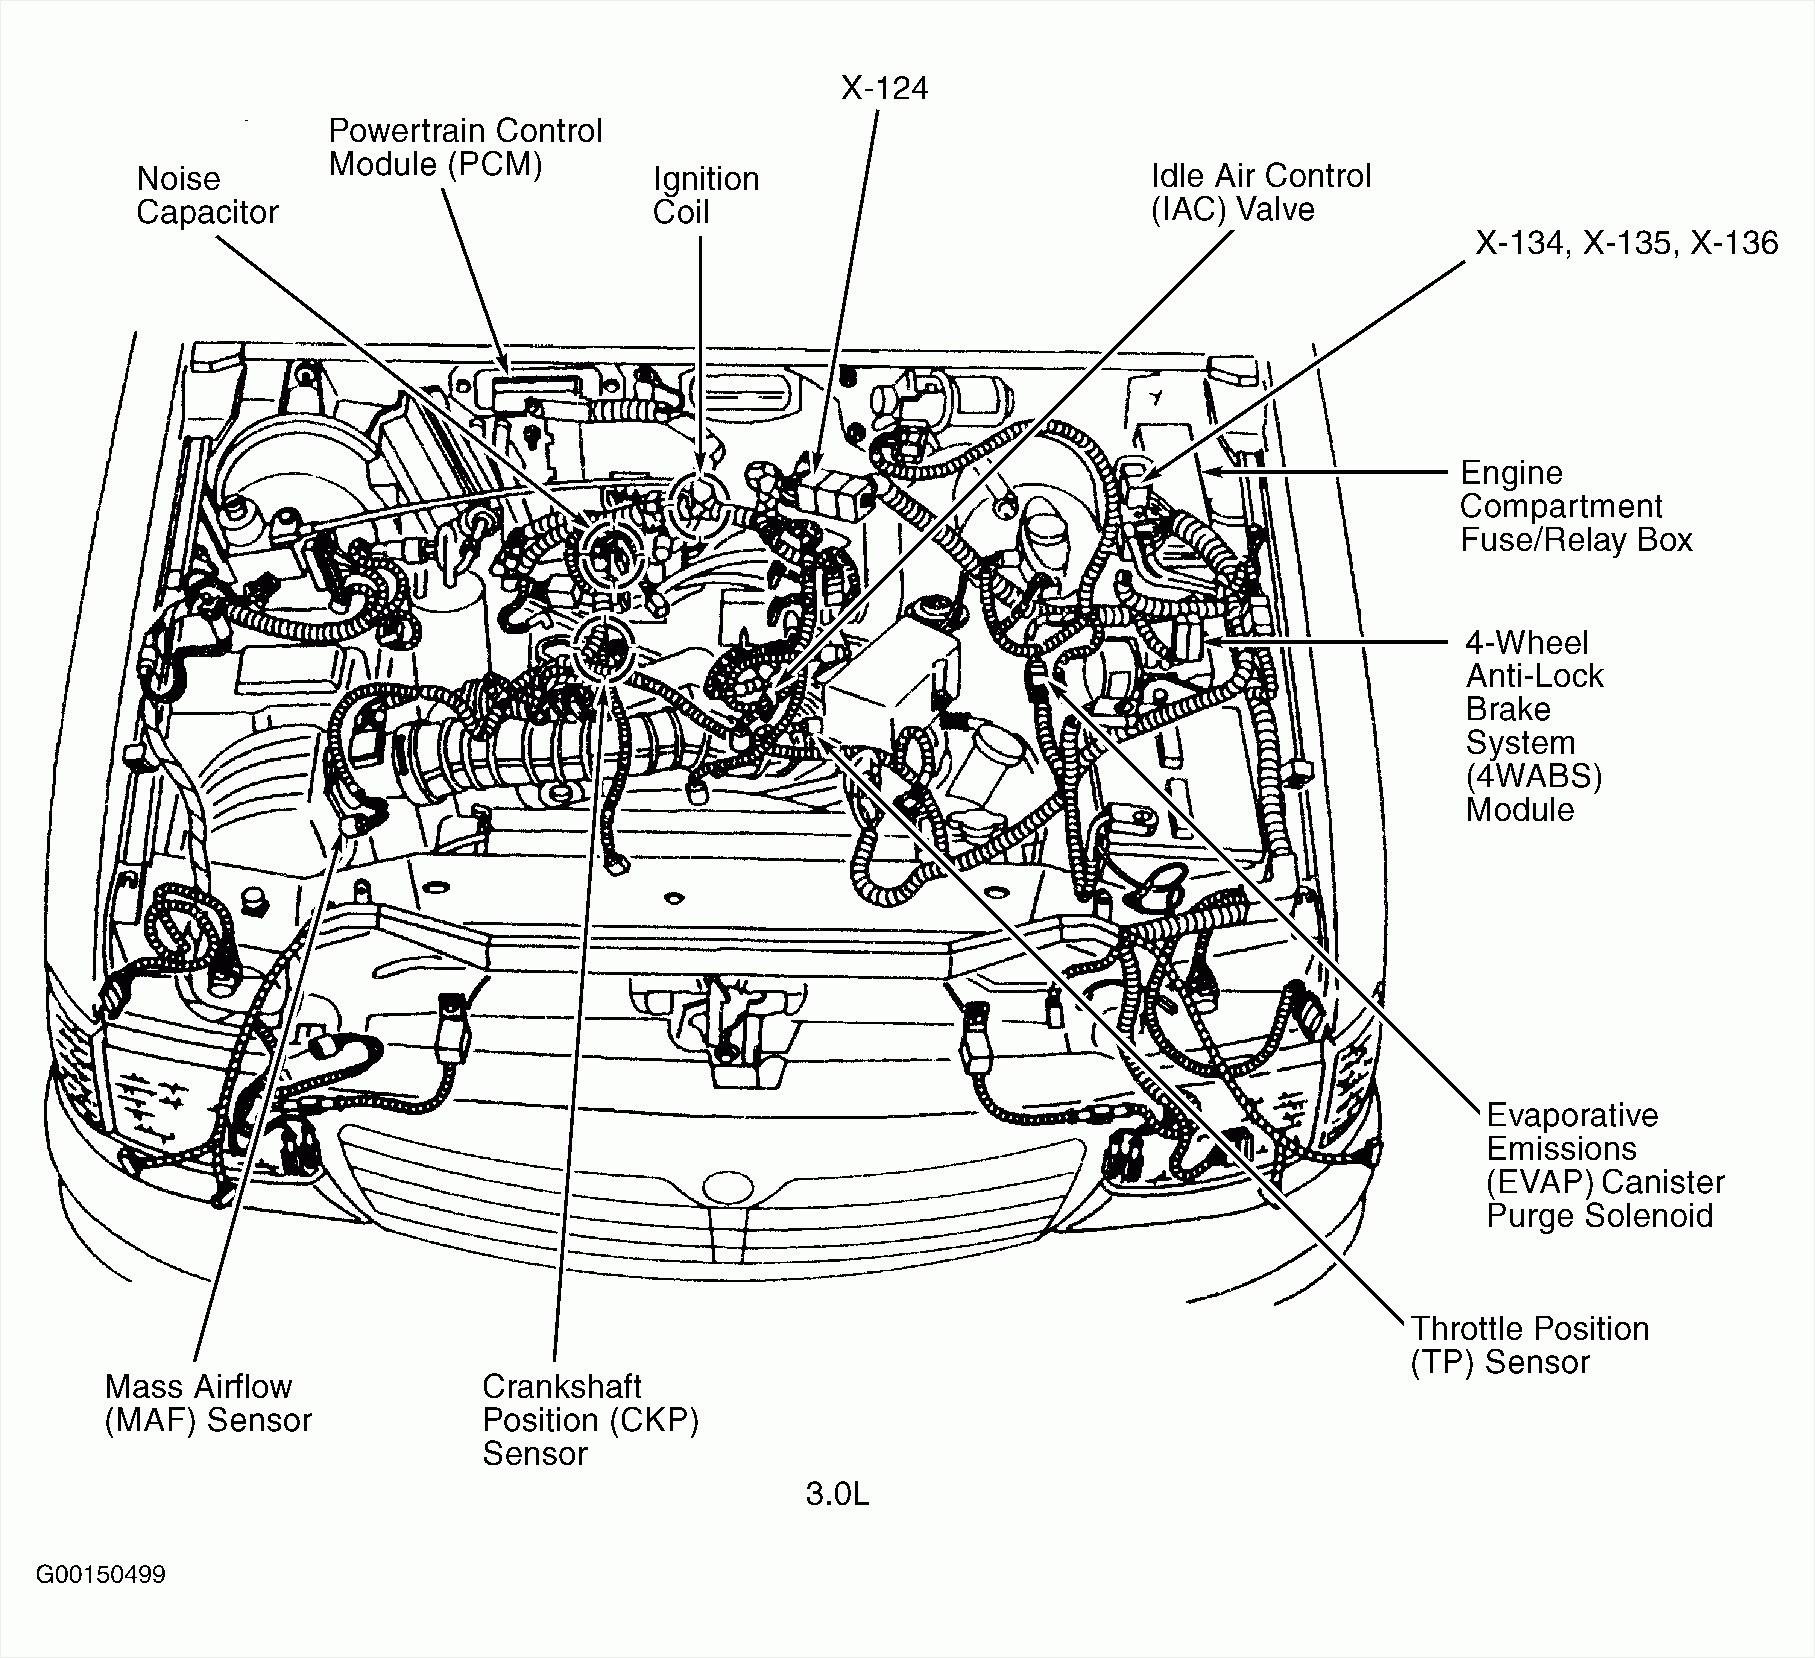 7152 2011 Volkswagen Cc Fuse Box Diagram Wiring Resources